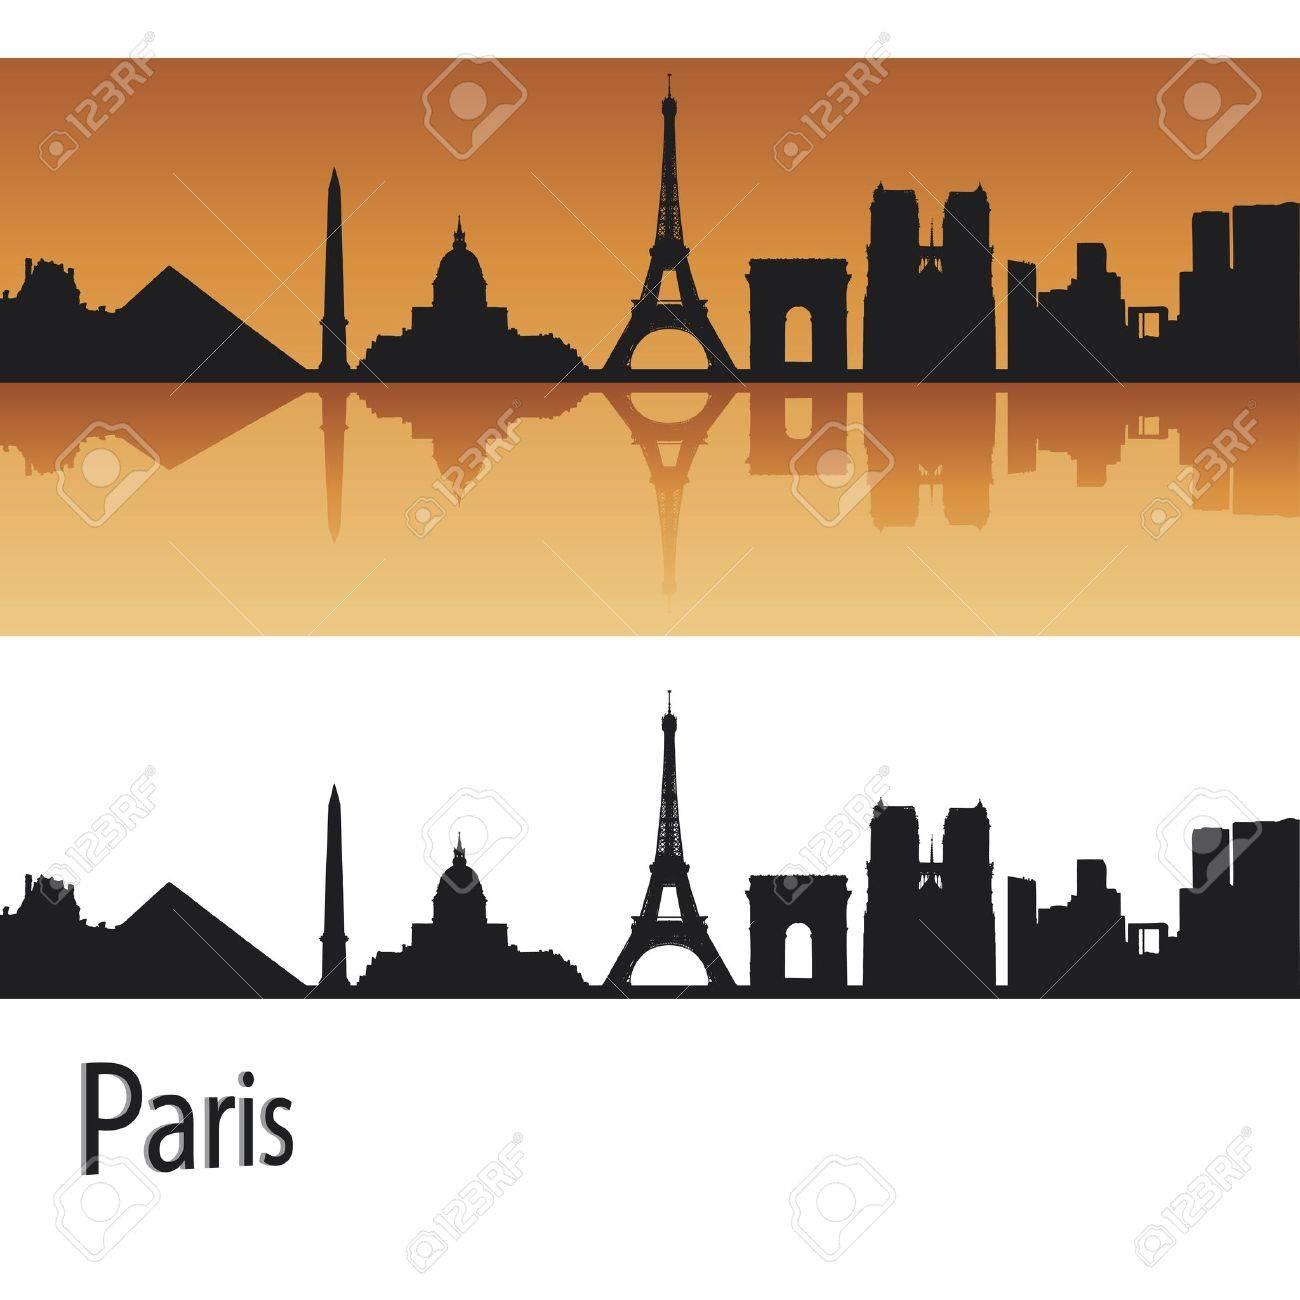 Paris skyline in orange background in editable vector file Stock Vector - 11157305